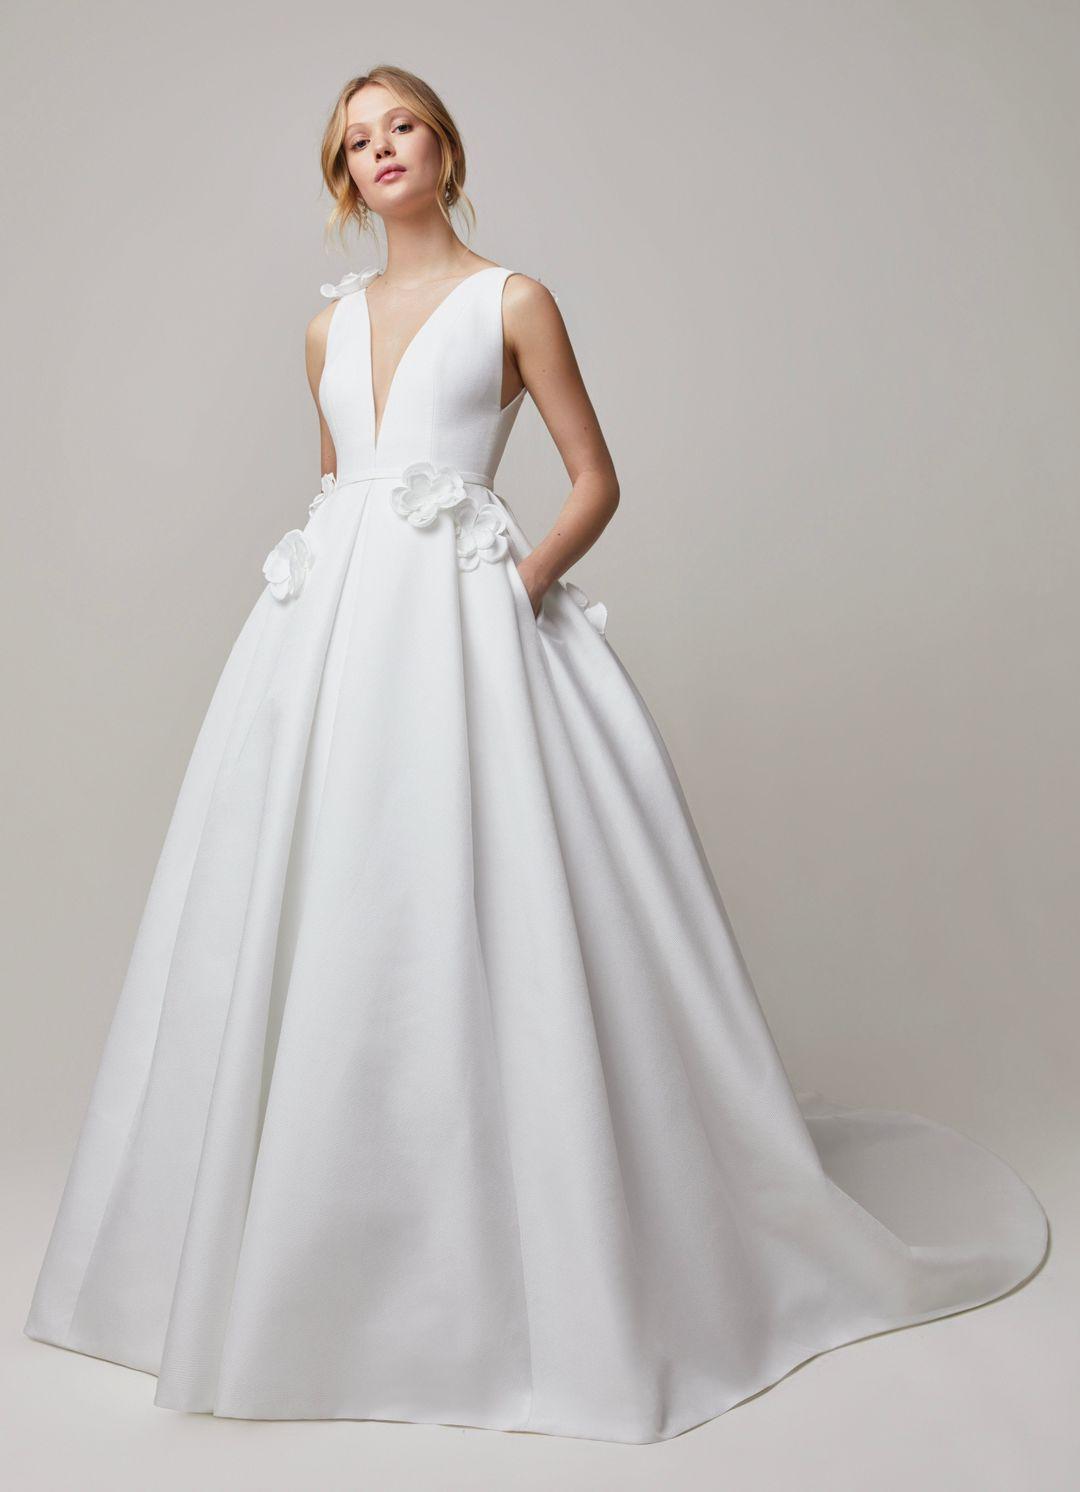 205 dress photo